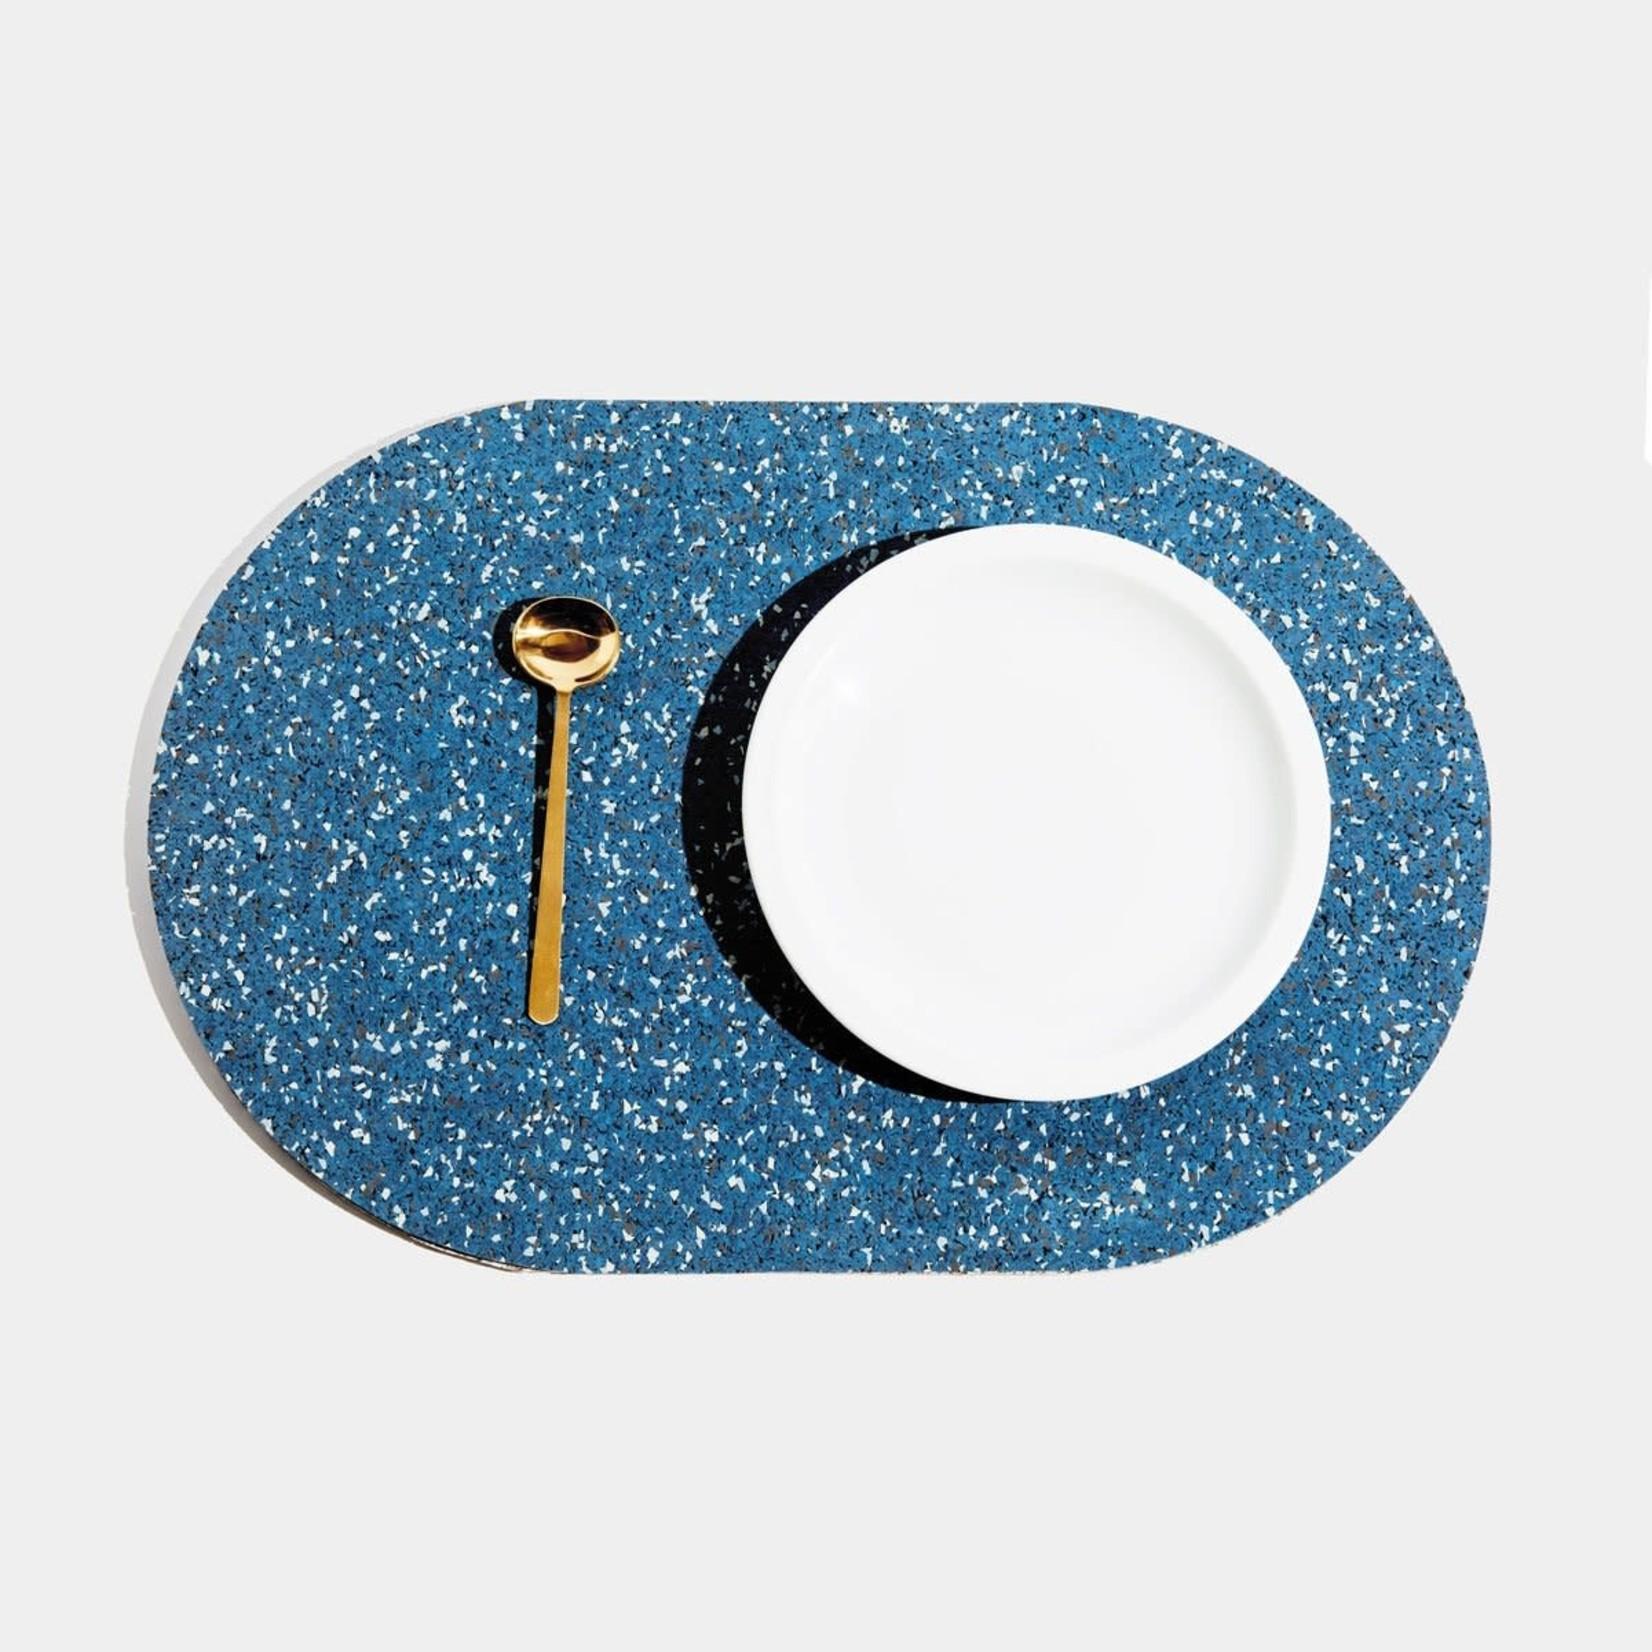 Slash Objects Slashed Objects Capsule Placemat Royal